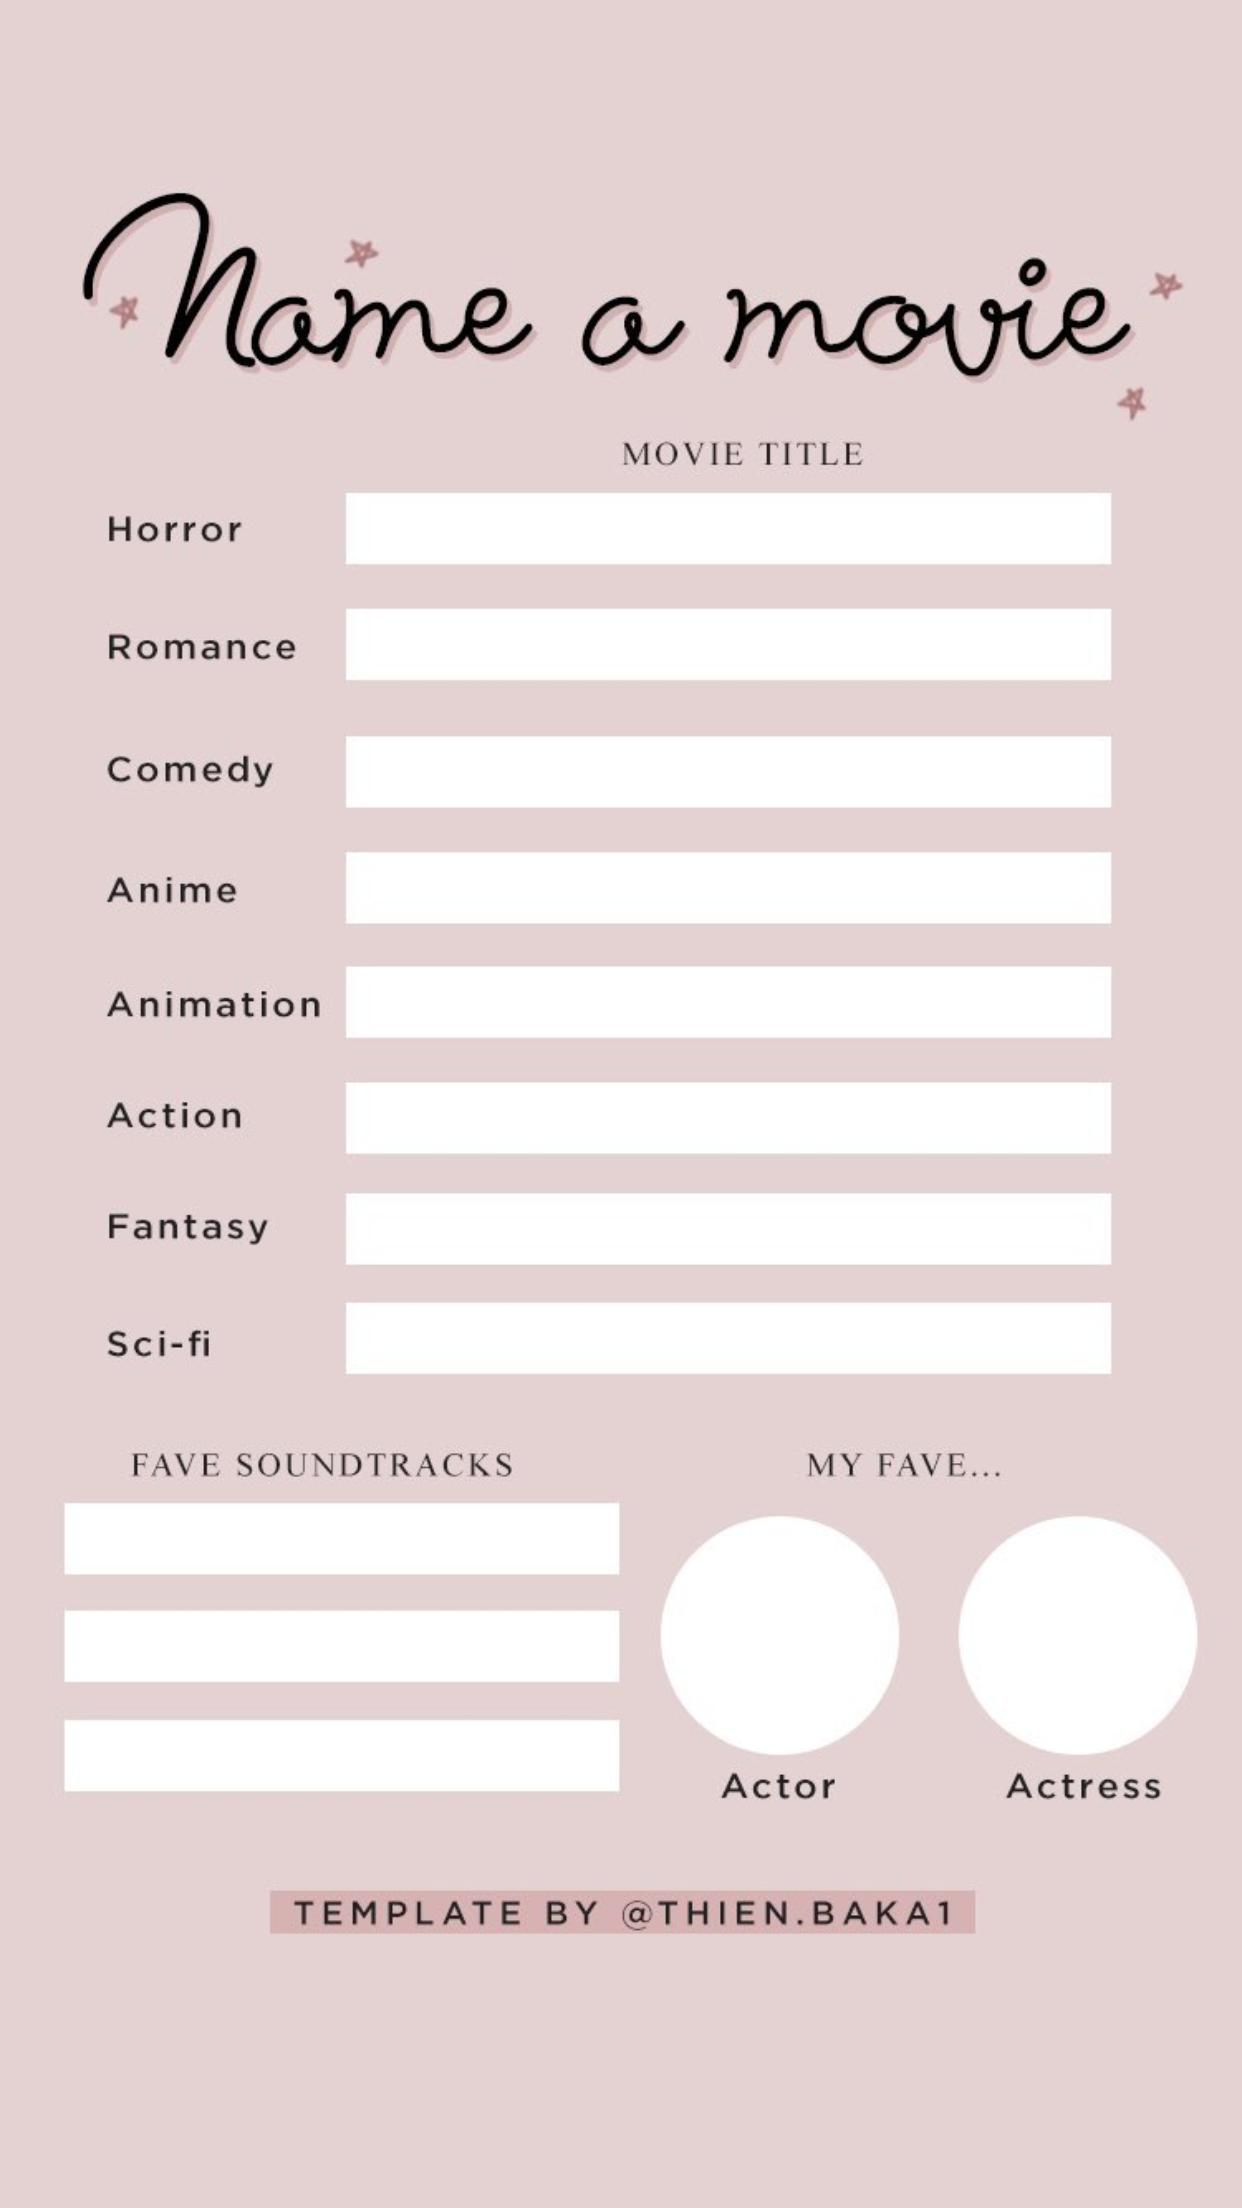 Pin By Shannon Elizabeth On Photography Inspiration Instagram Story Template Romance Comedy Movie Soundtracks